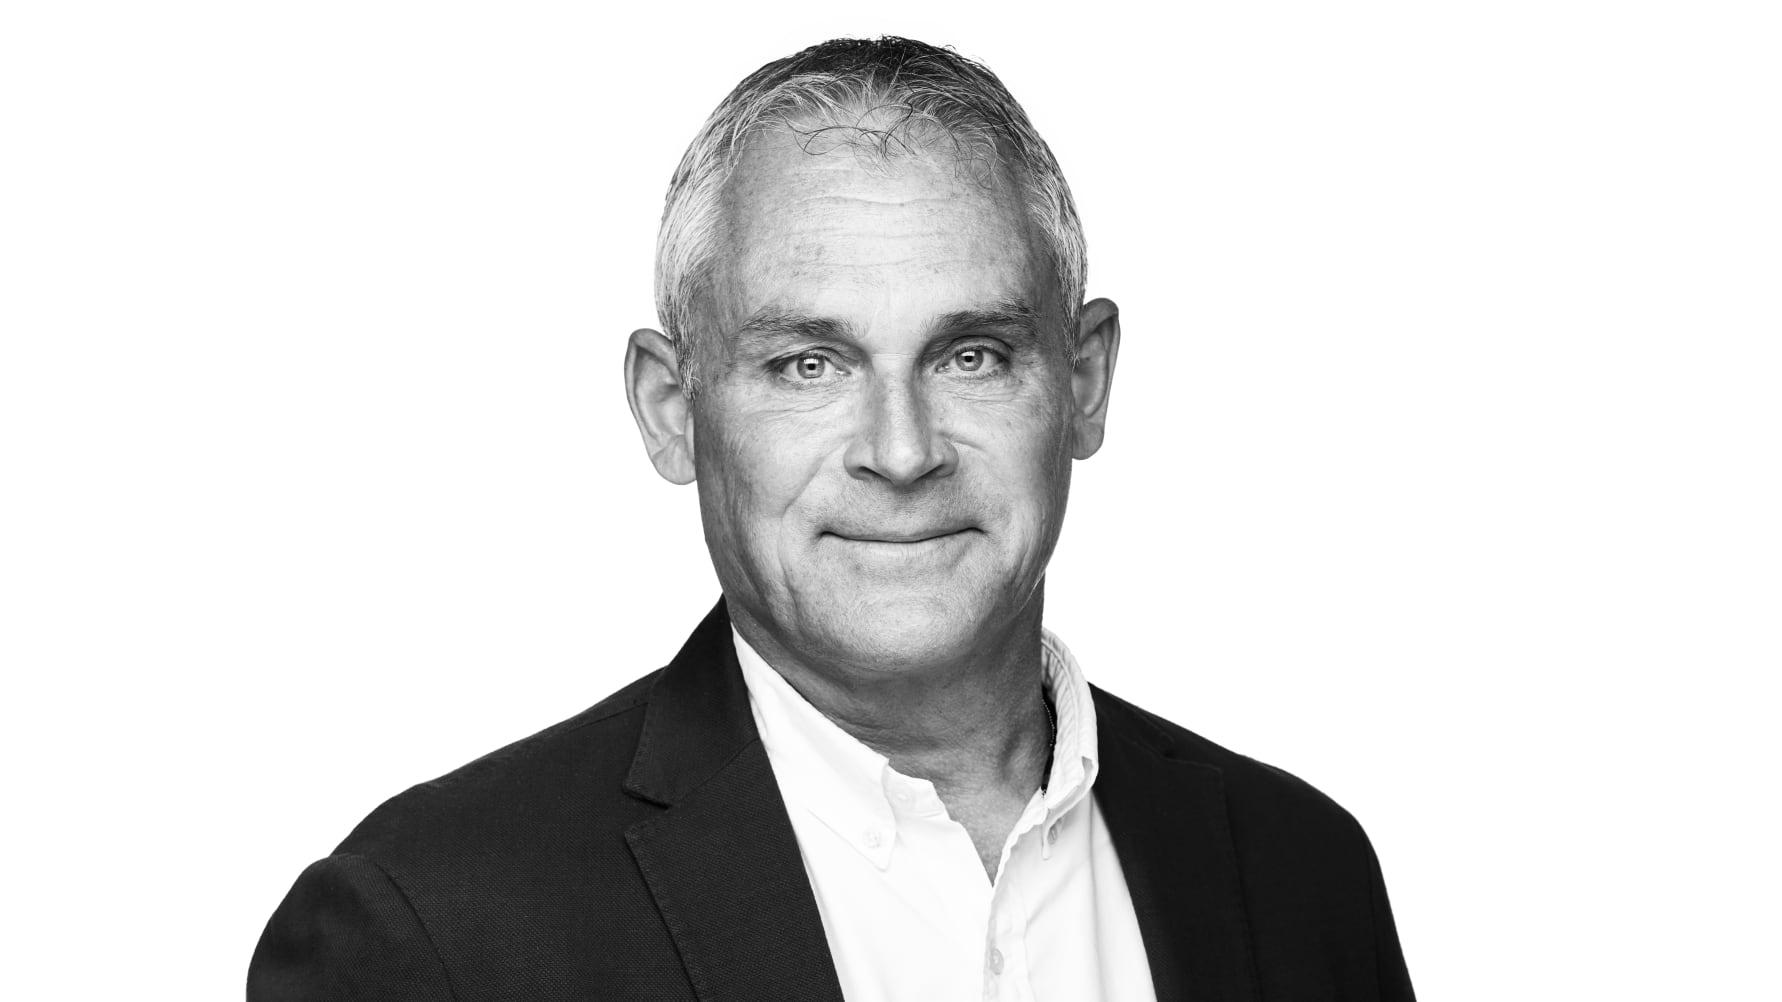 Stefan-Rundberg-Handheld-Director-of-Purchasing